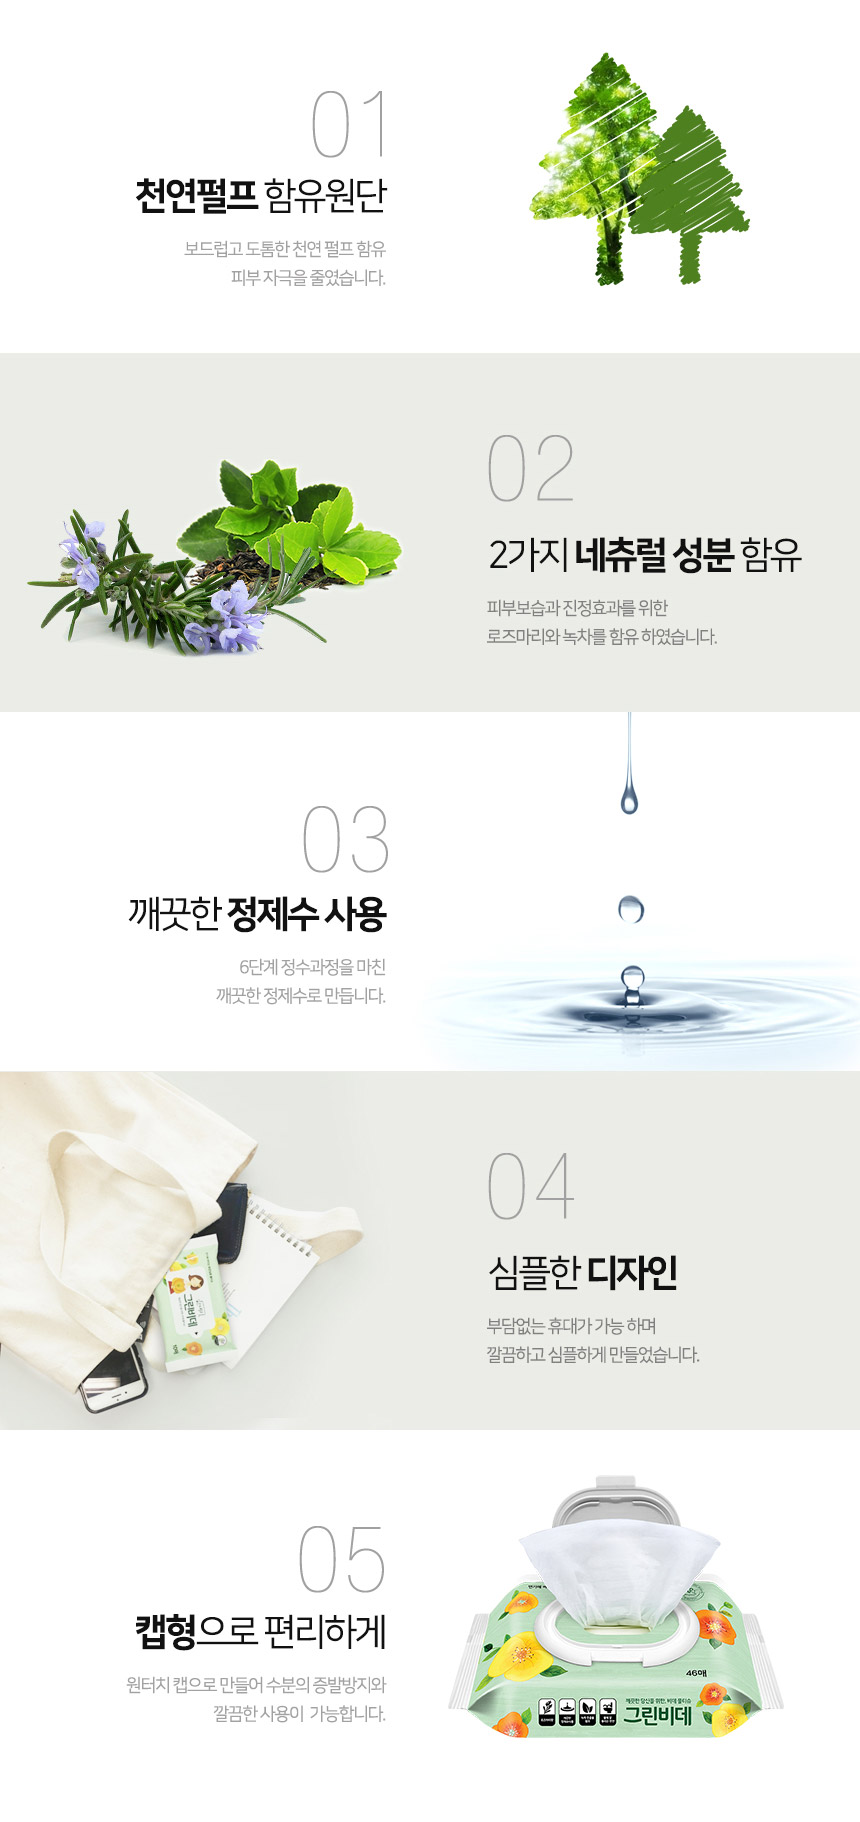 20170426_han_wt2_page_03.jpg